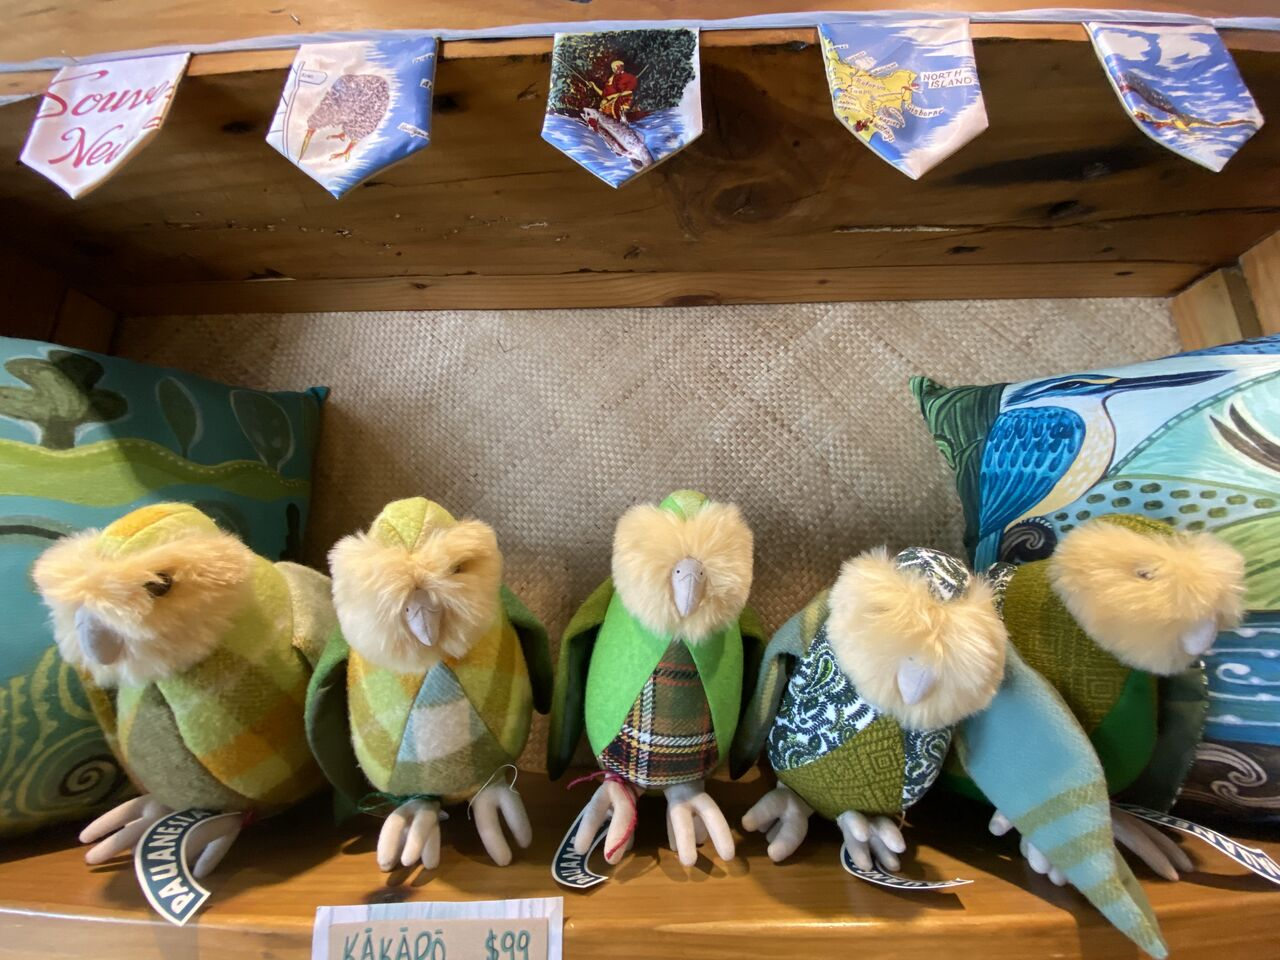 Kakapo 02